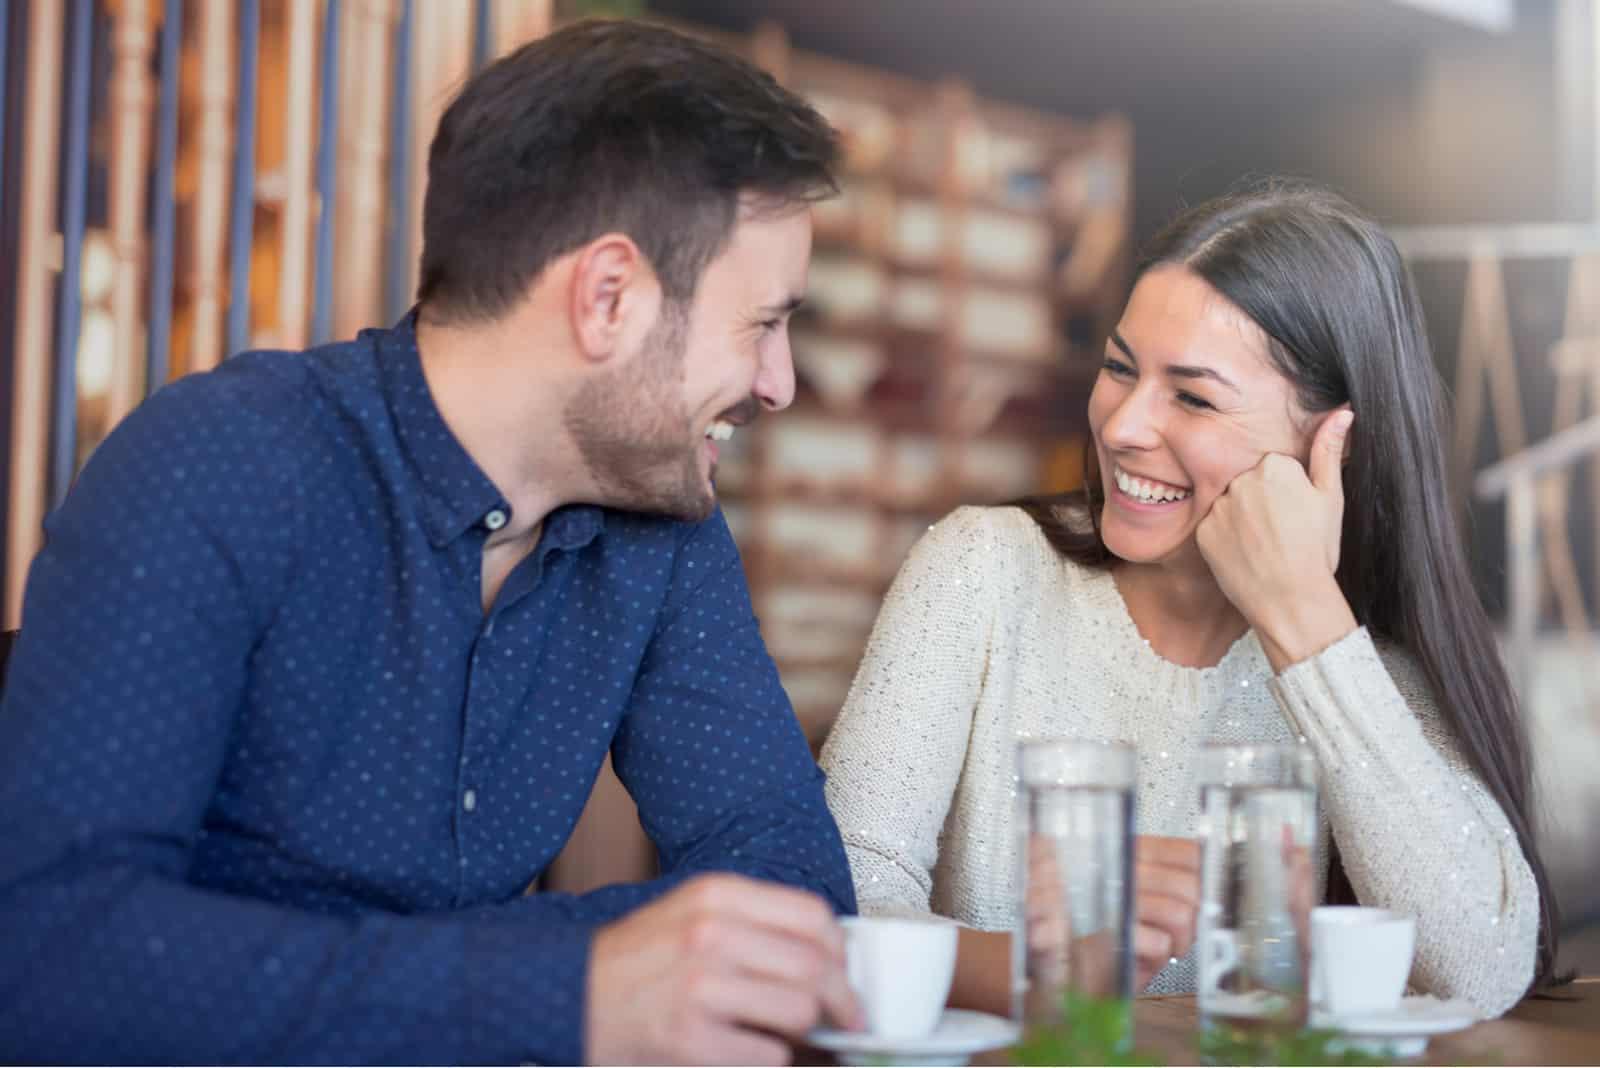 Flirter dans un café